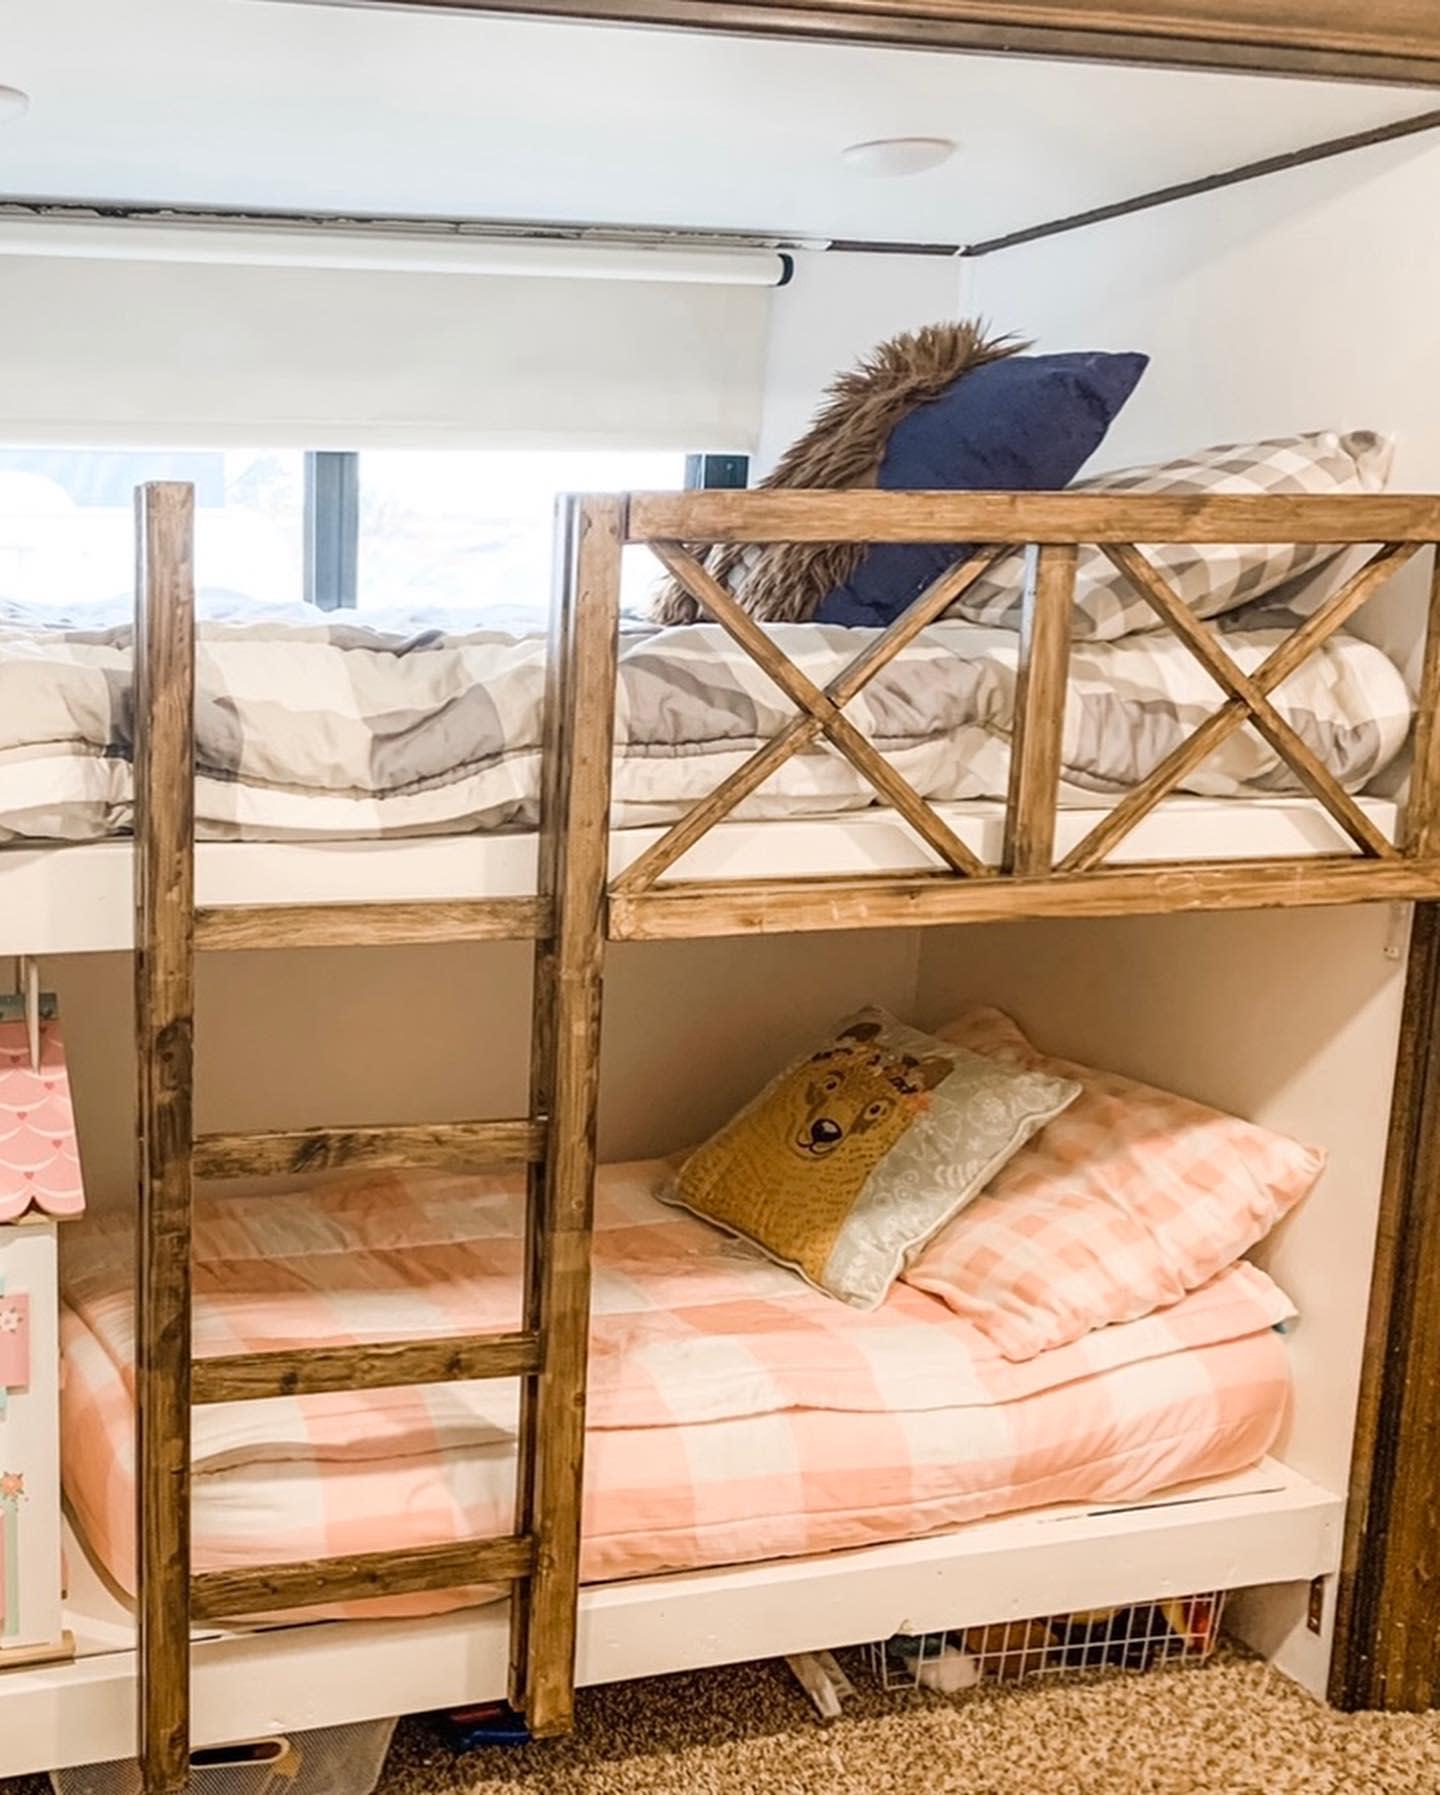 bunk-beds-room-small-room-ideas-humbills-homeonwheels